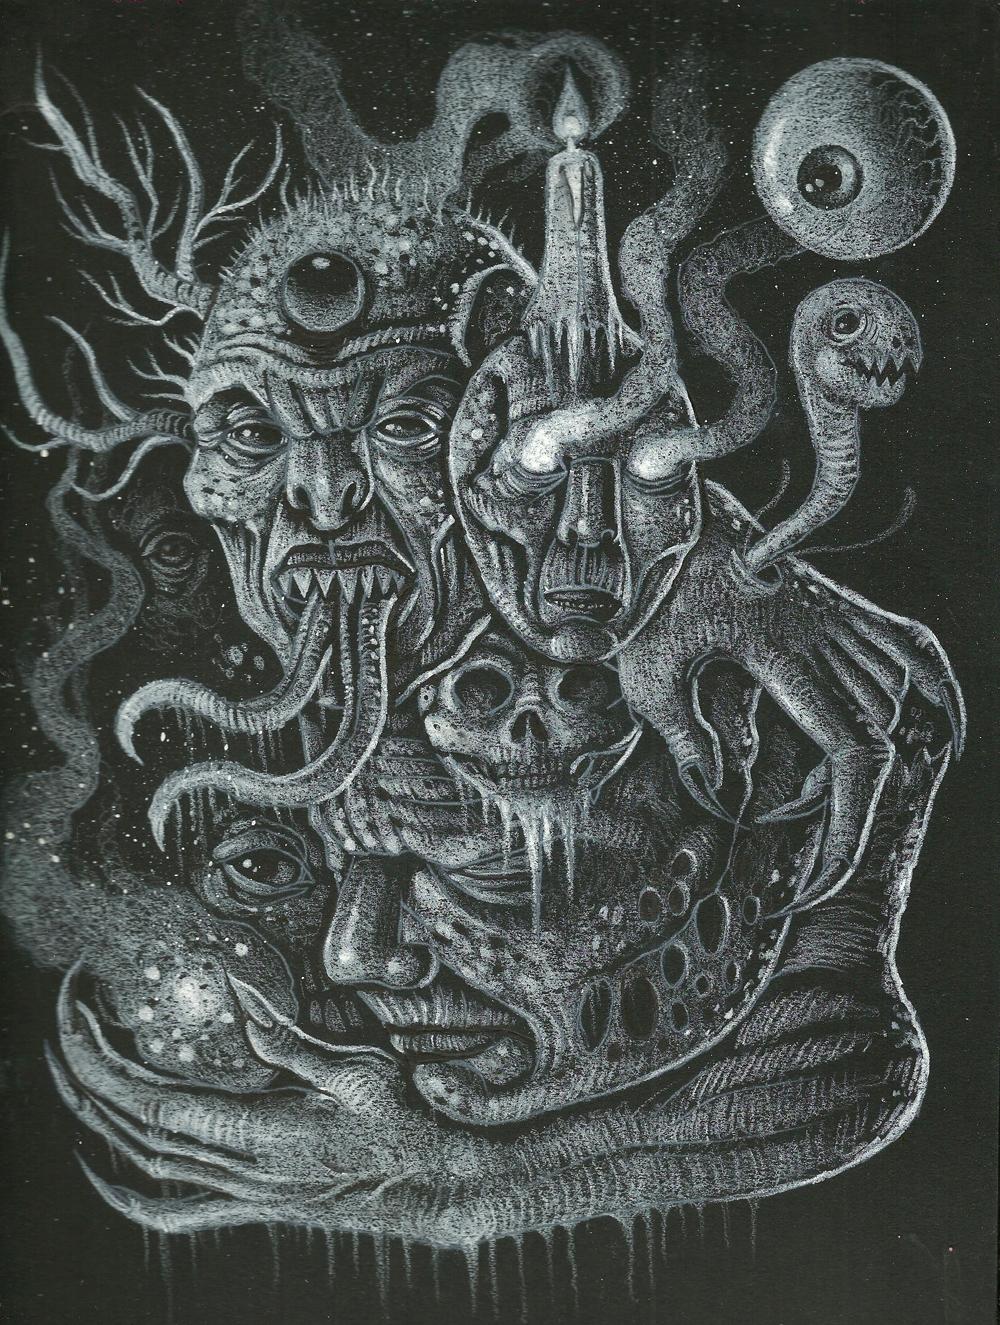 White Chaos - drawing, blackandwhite - curseddeath | ello